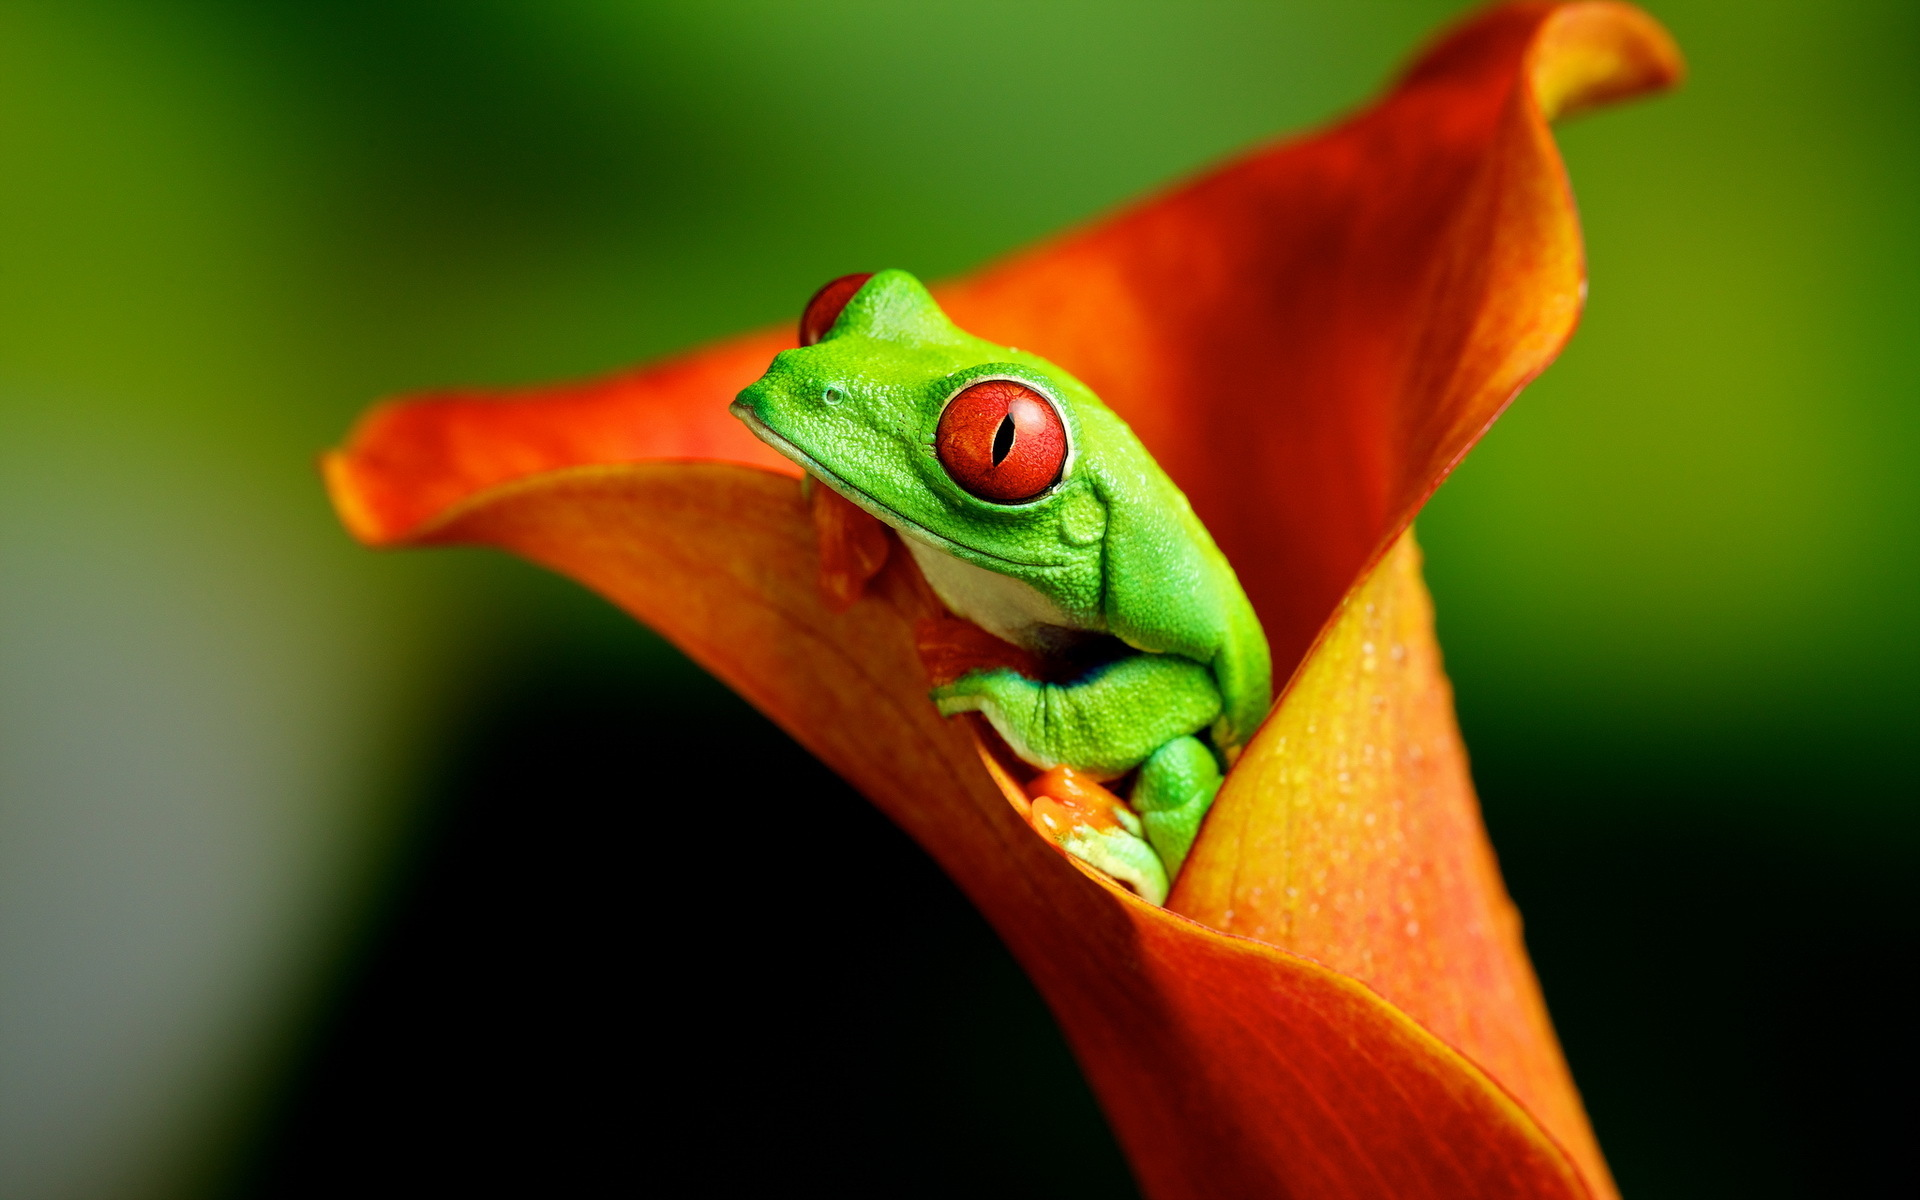 Frog Wallpaper · Frog Wallpaper ...